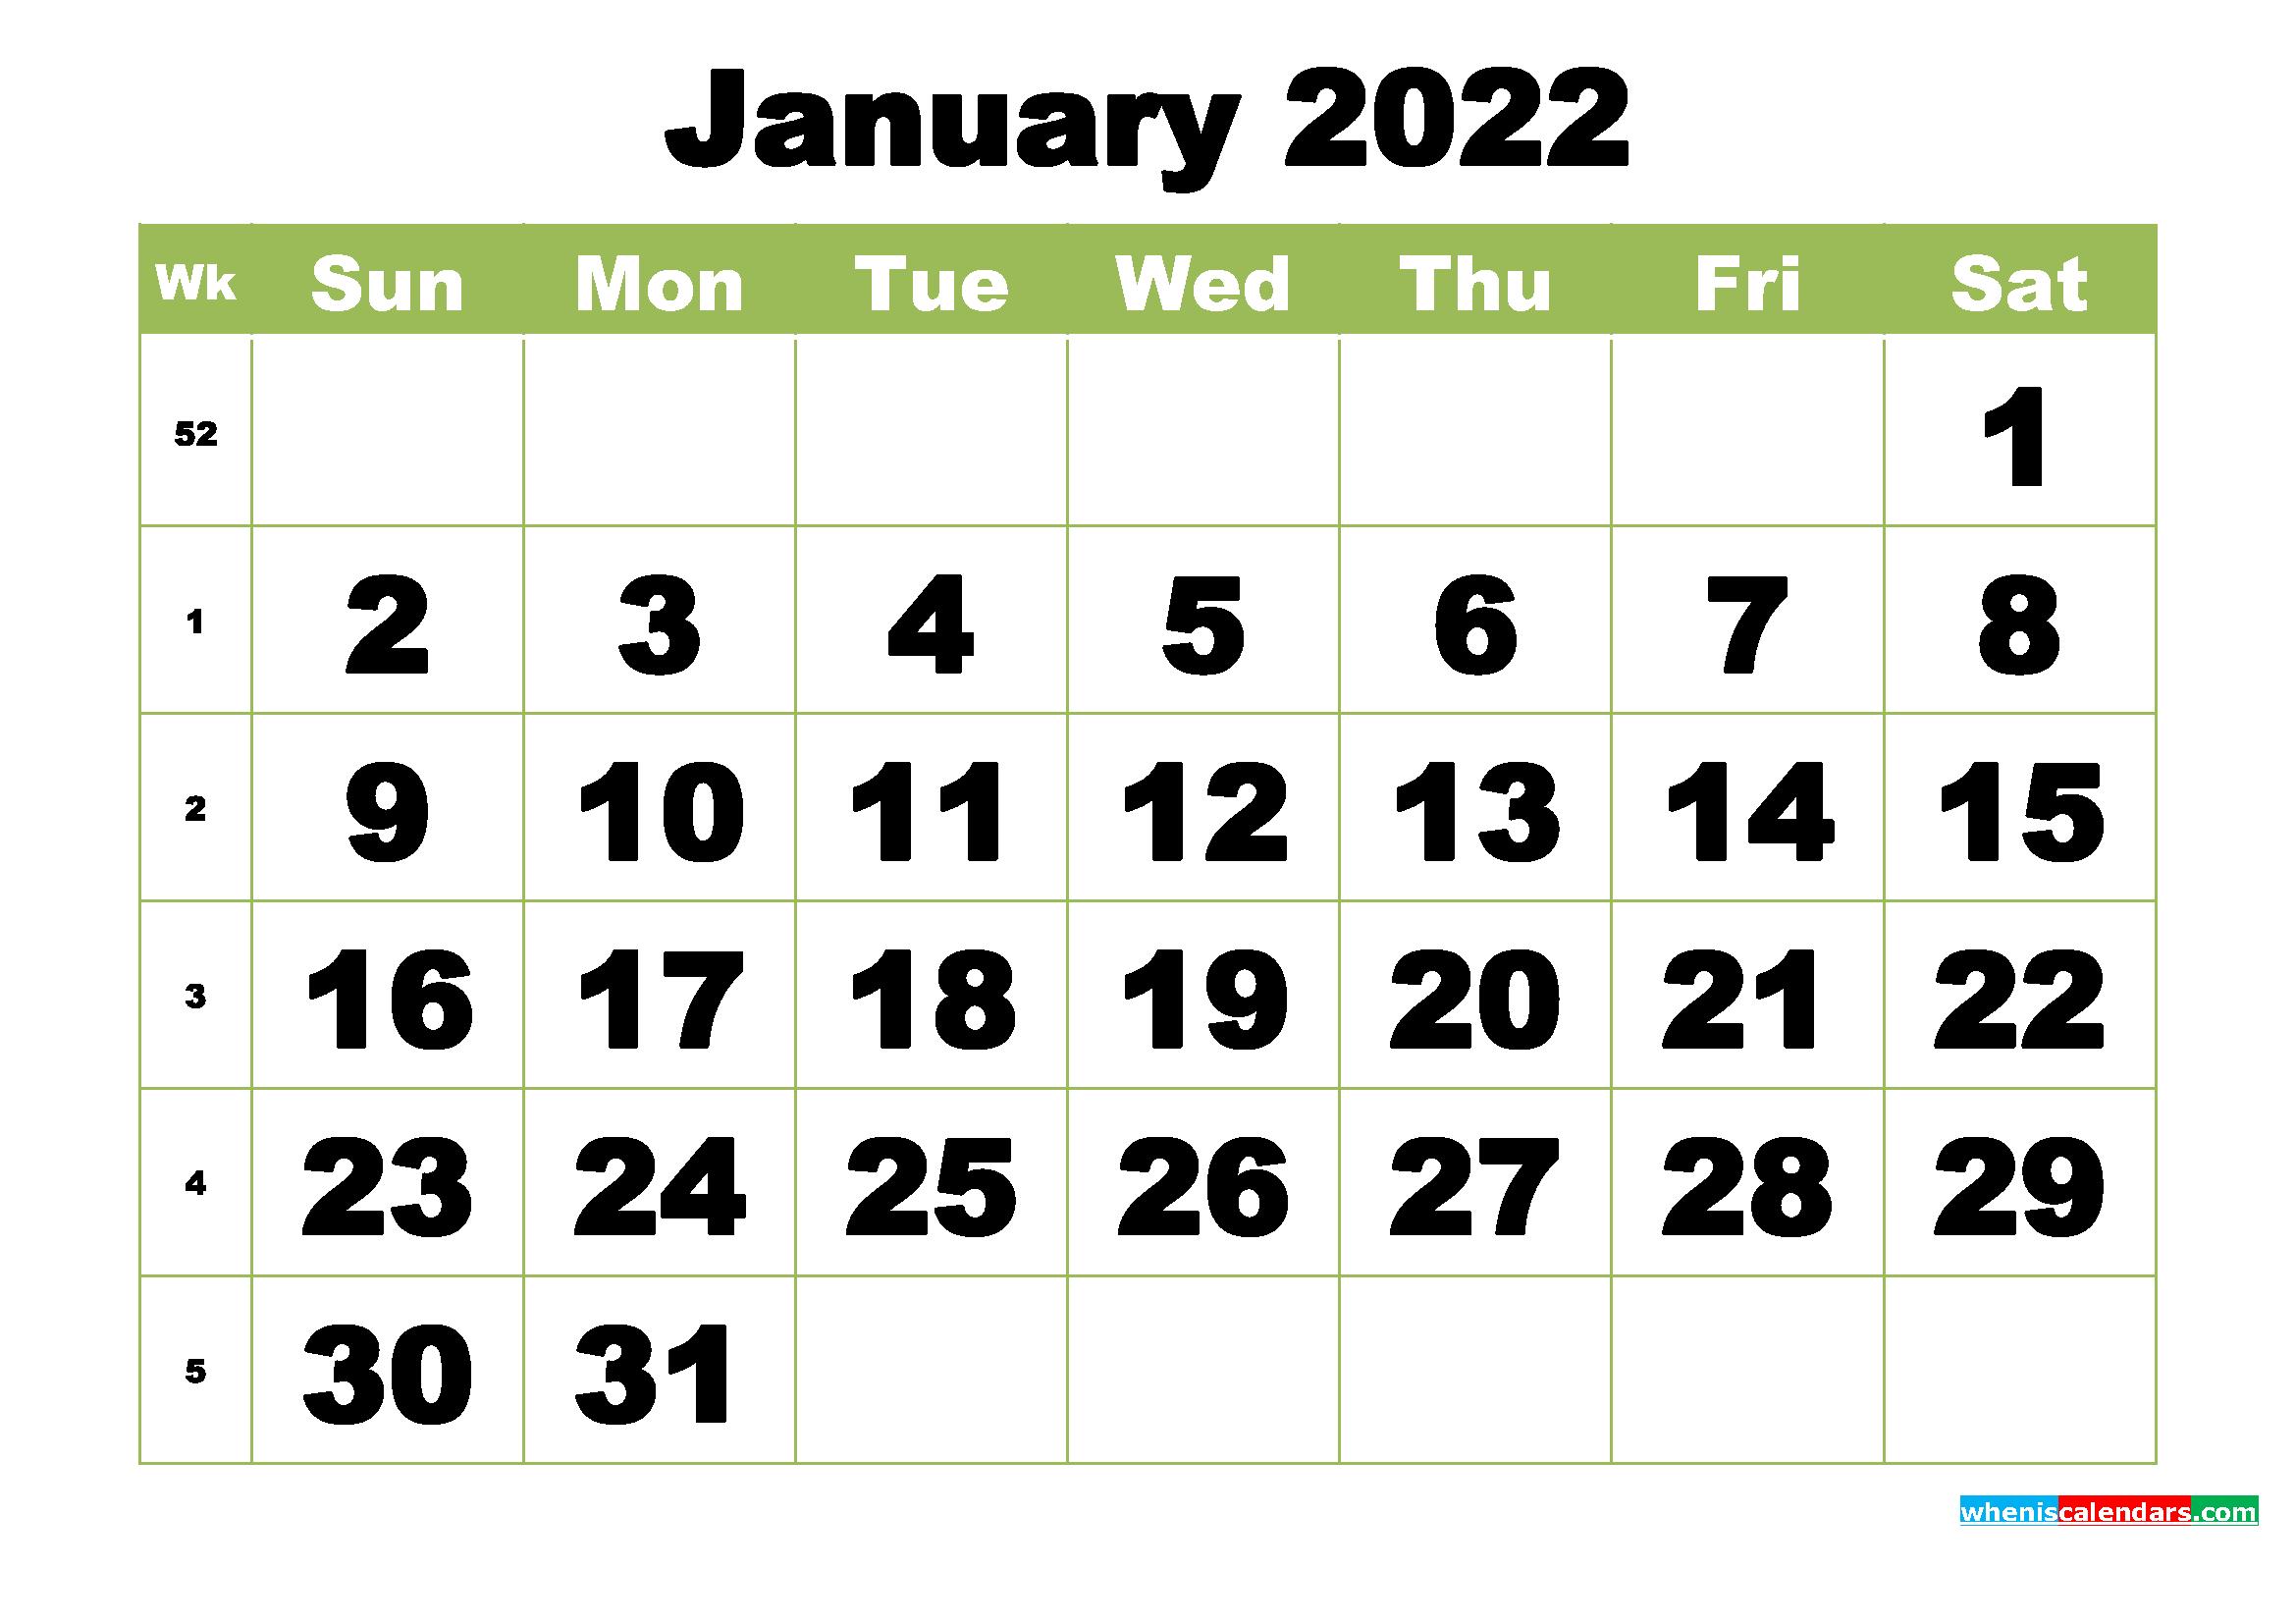 Free Printable Monthly Calendar January 2022 - Free ...